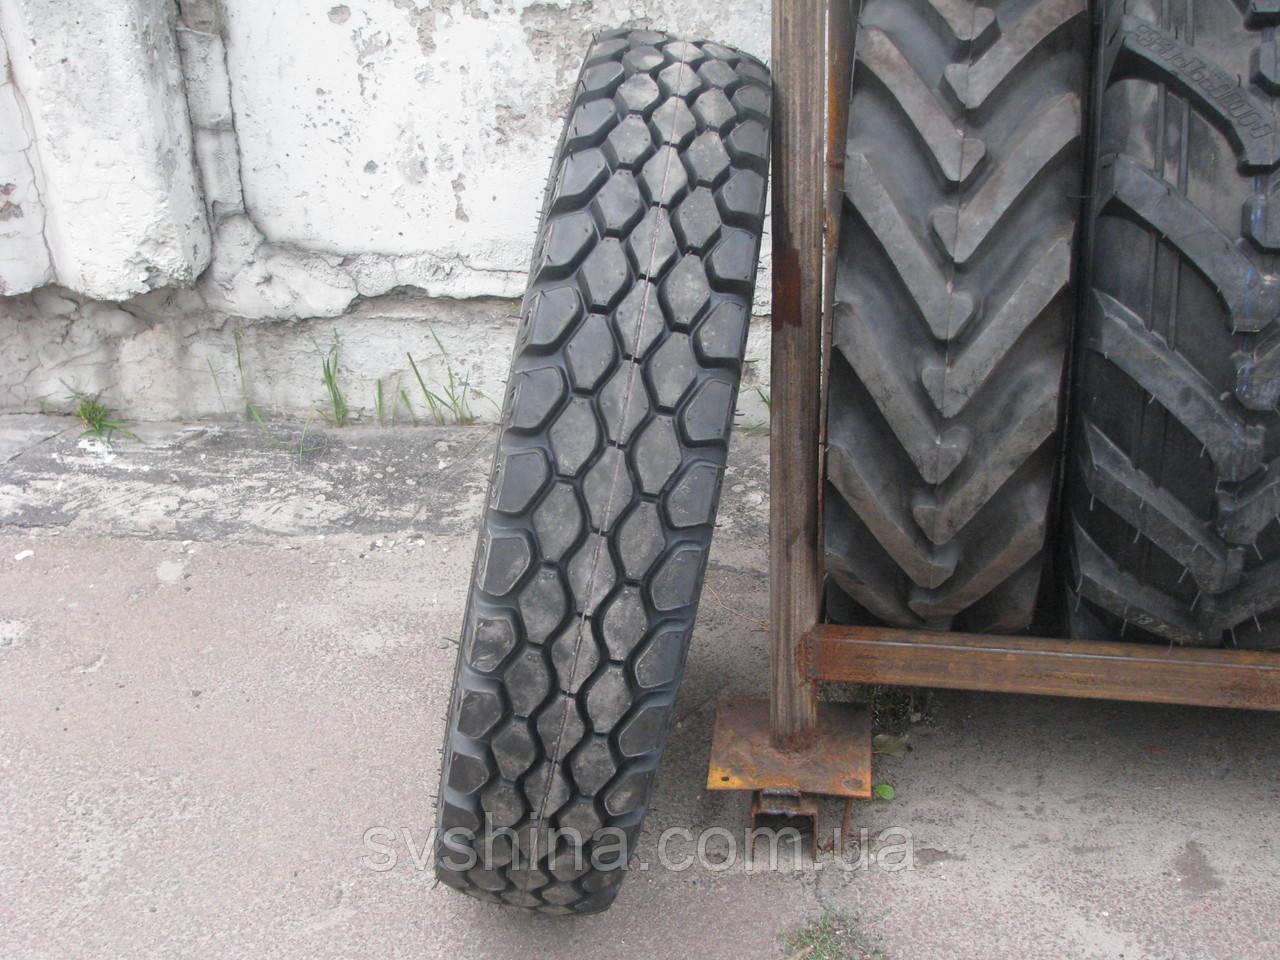 Грузовые шины 9.00R20 (260R508) Белшина И-Н142Б, 14 нс.